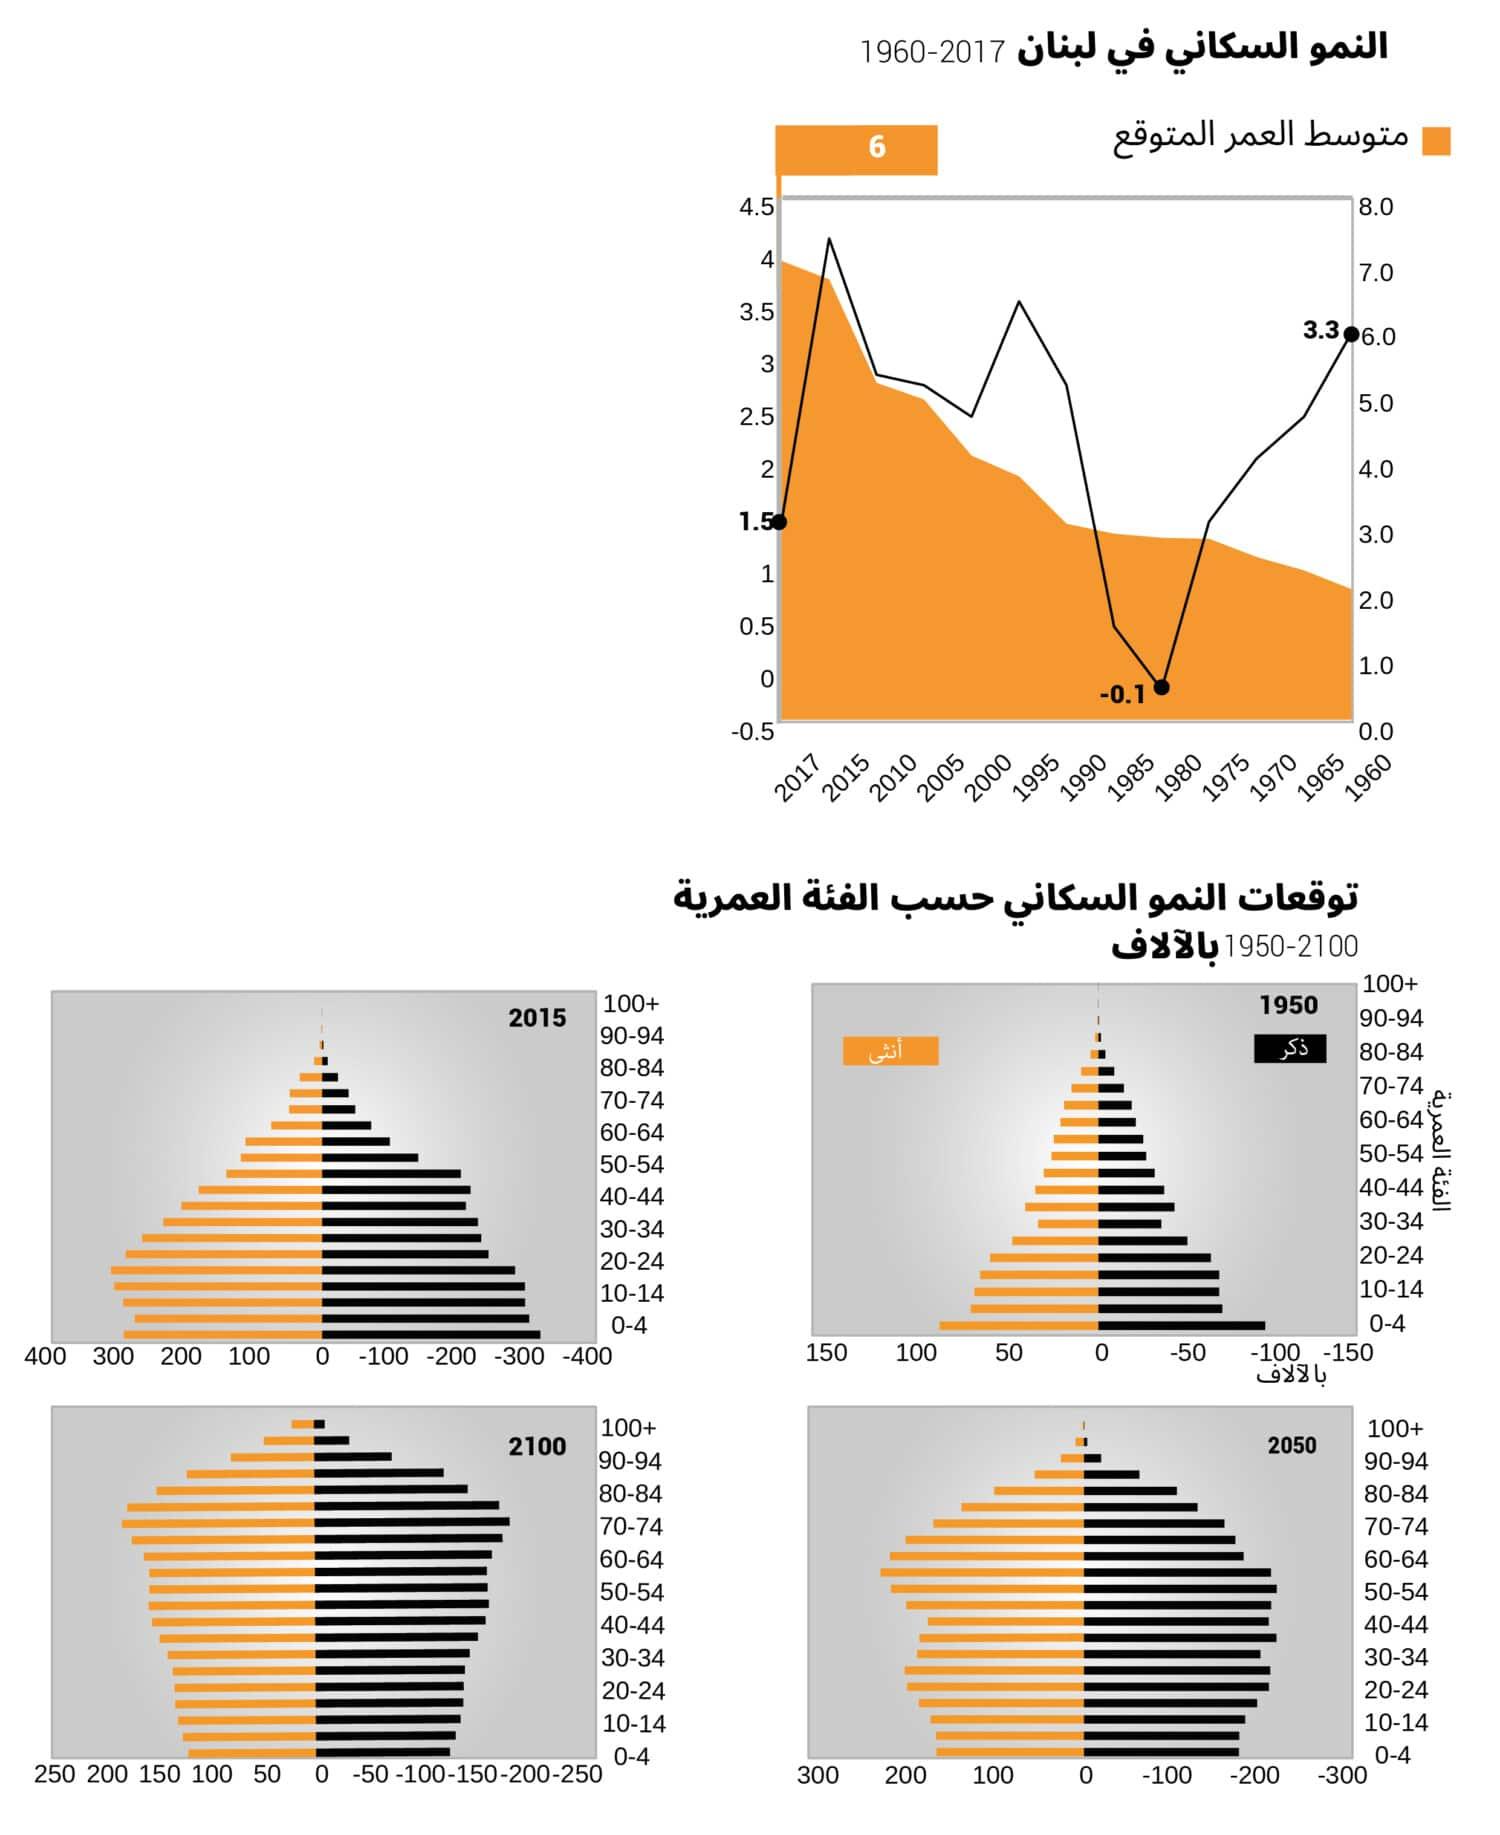 lebanon population growth